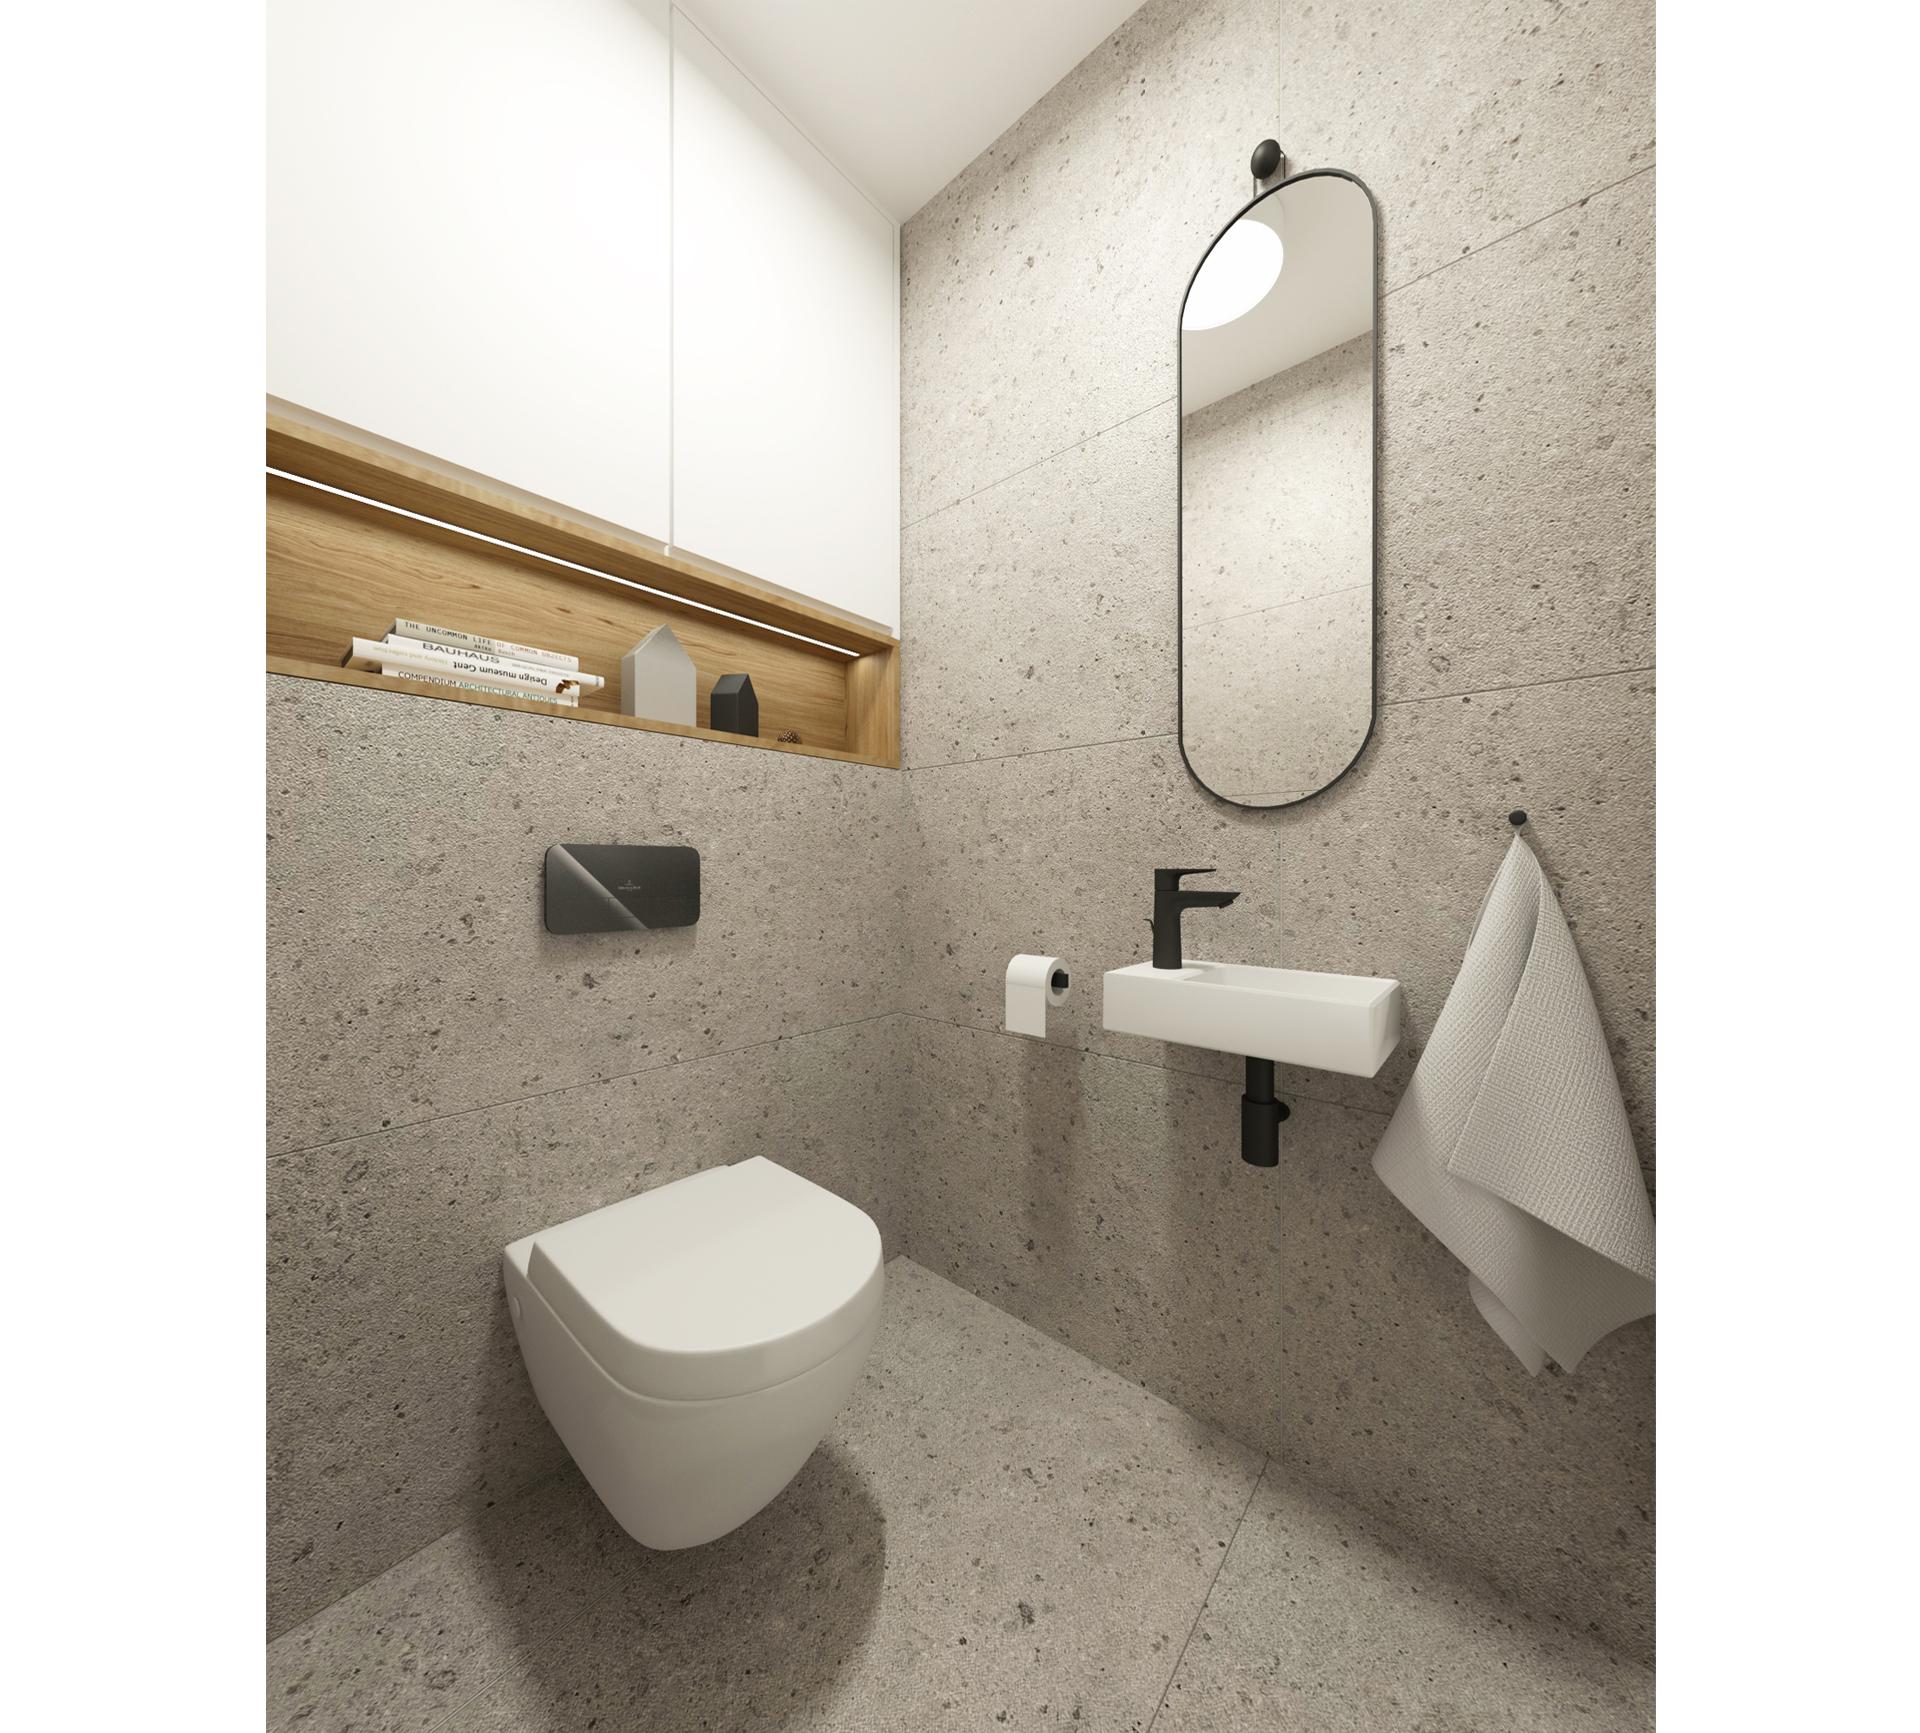 rekonstrukcia bytu, rekonstrukcia bytu bratislava, navrh wc, rekonstrukcia jadra, V&B tiles, oak, grey design, design interior, aberdeen, interior design